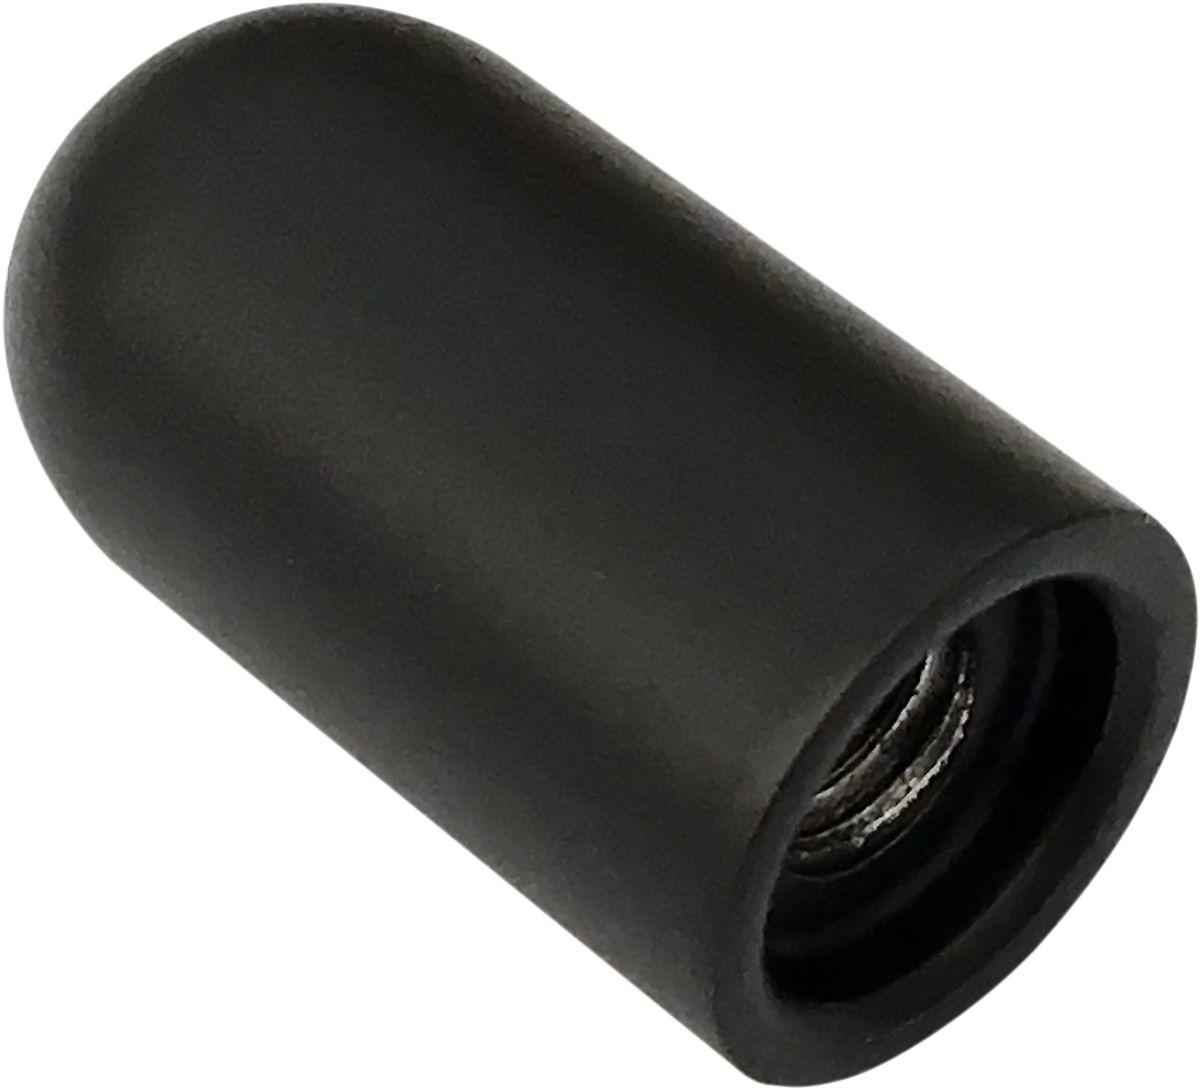 【Drag Specialties】鋁合金天線雙頭螺絲蓋 【CAP ANTENNA ALUMINUM [4401-0204]】 - 「Webike-摩托百貨」